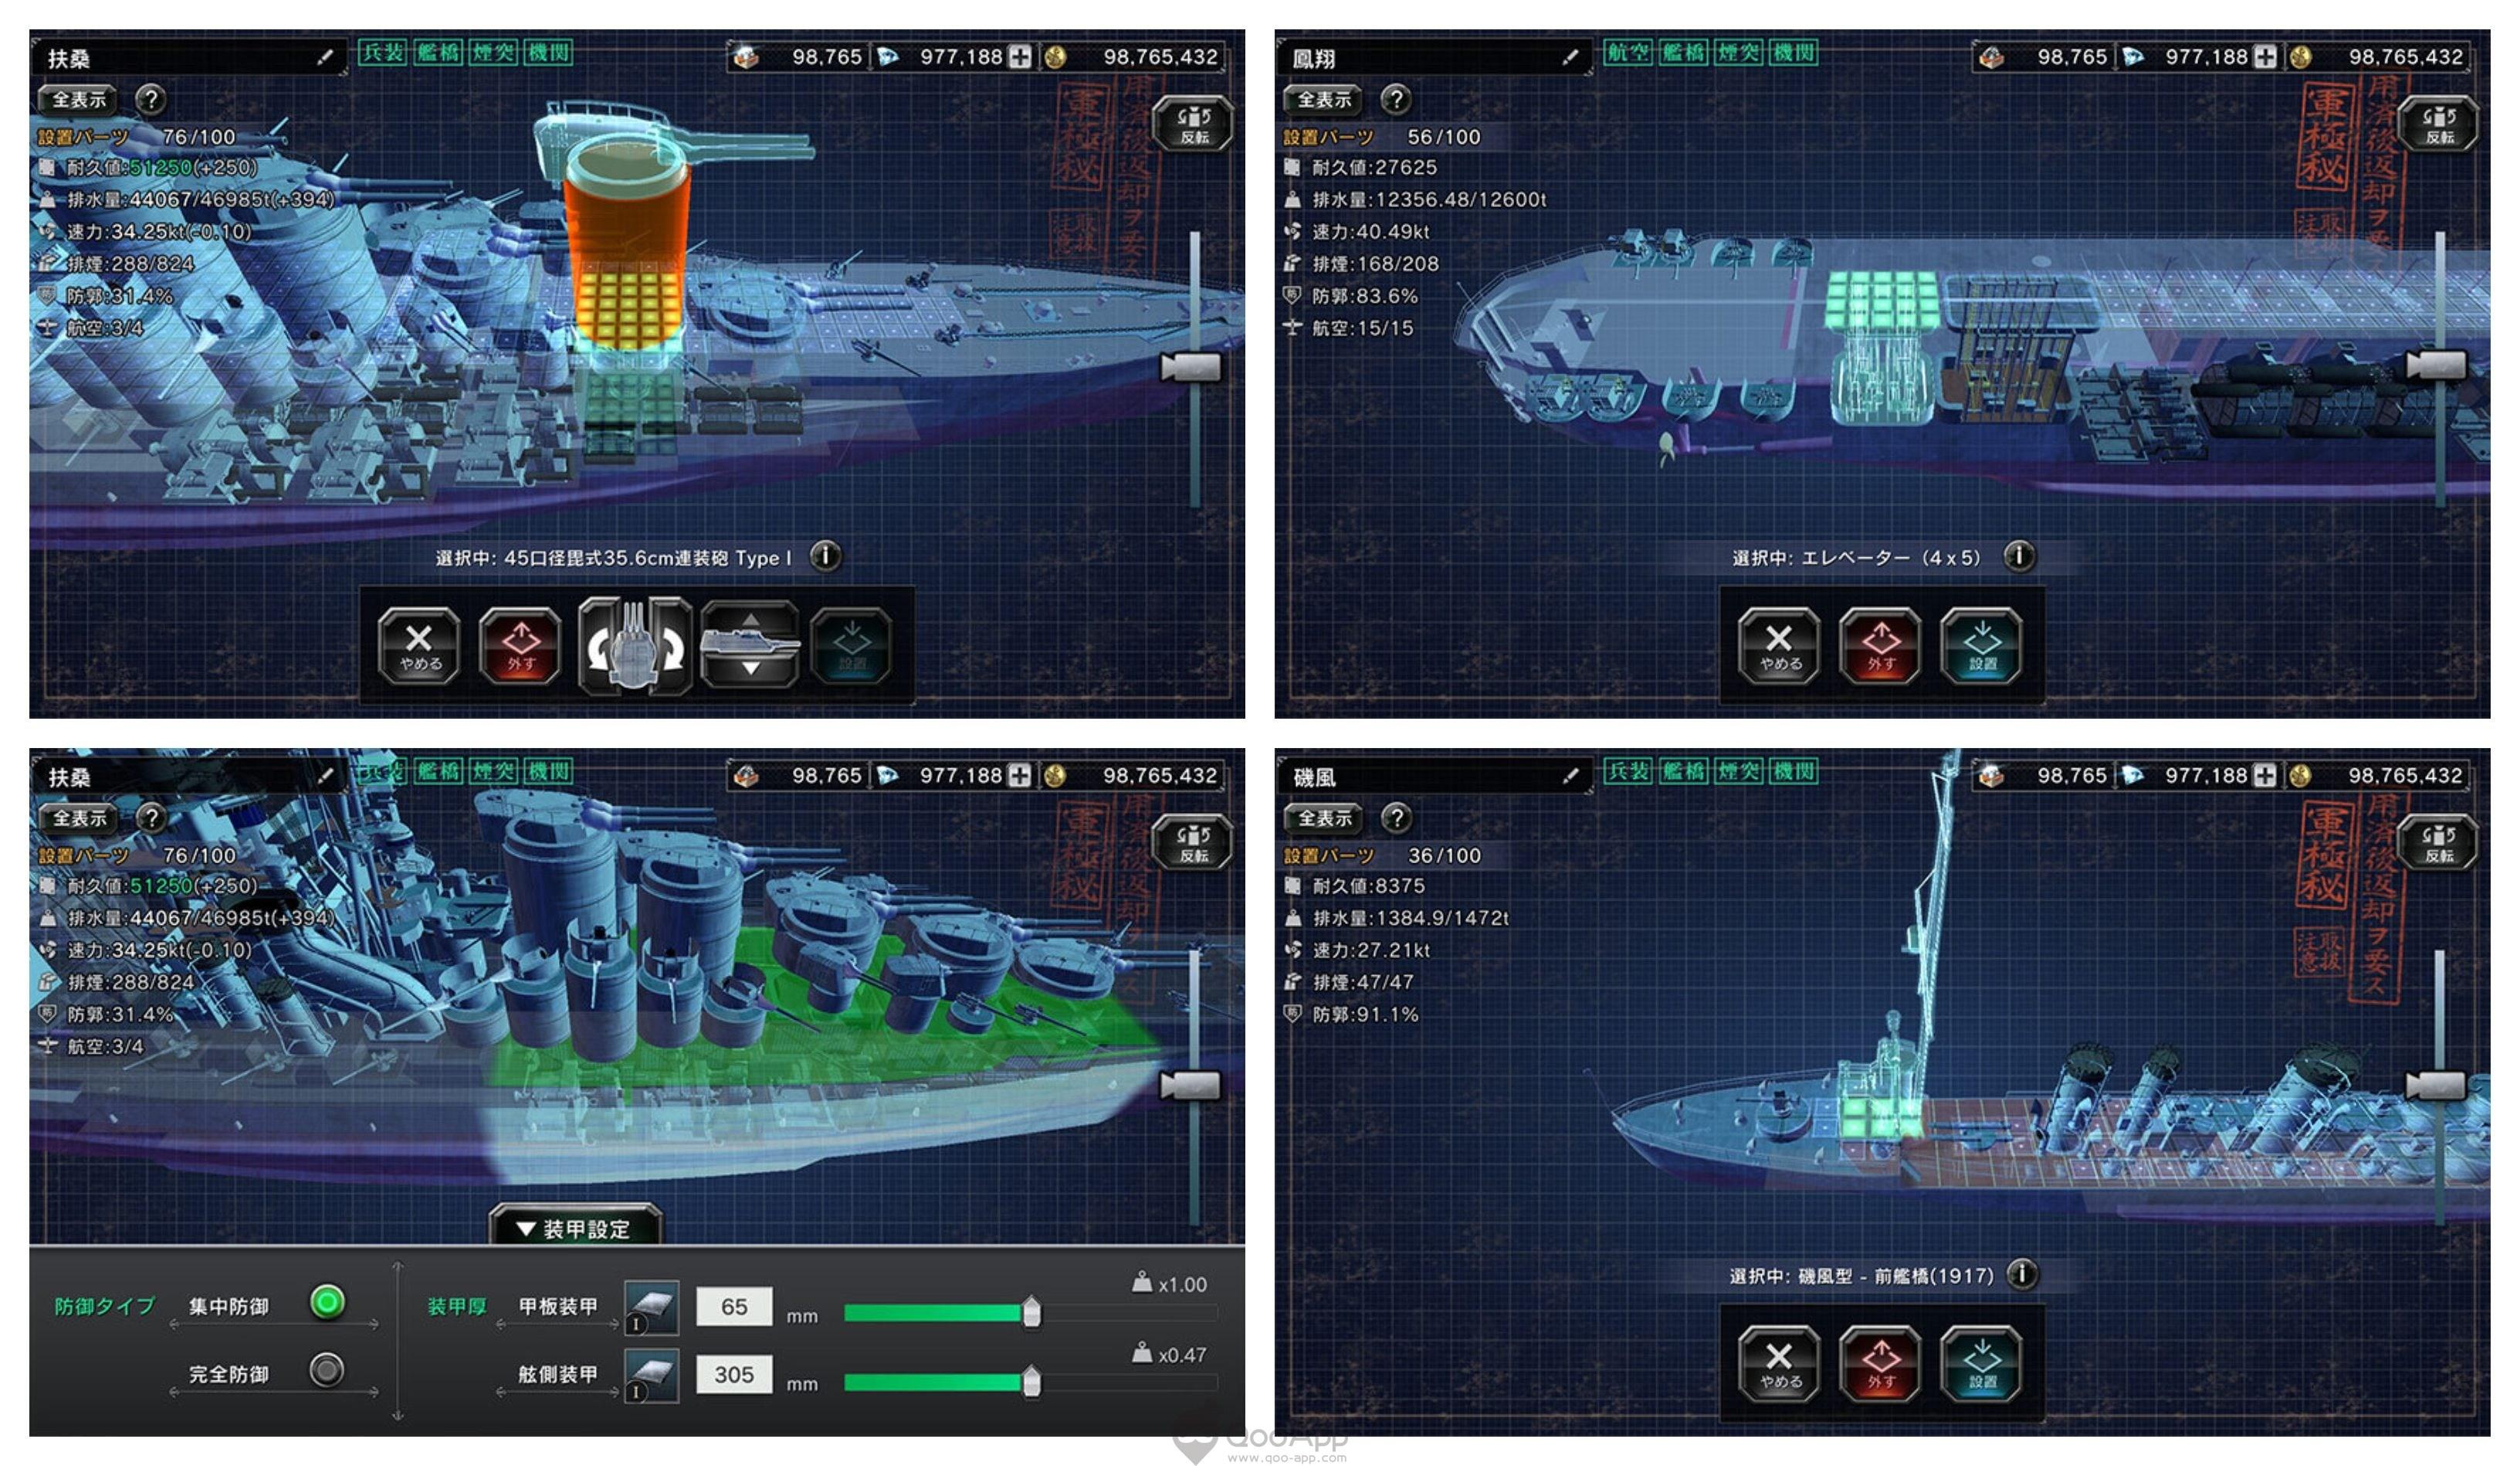 《Warship Craft》正式发布 游戏玩法特色介绍